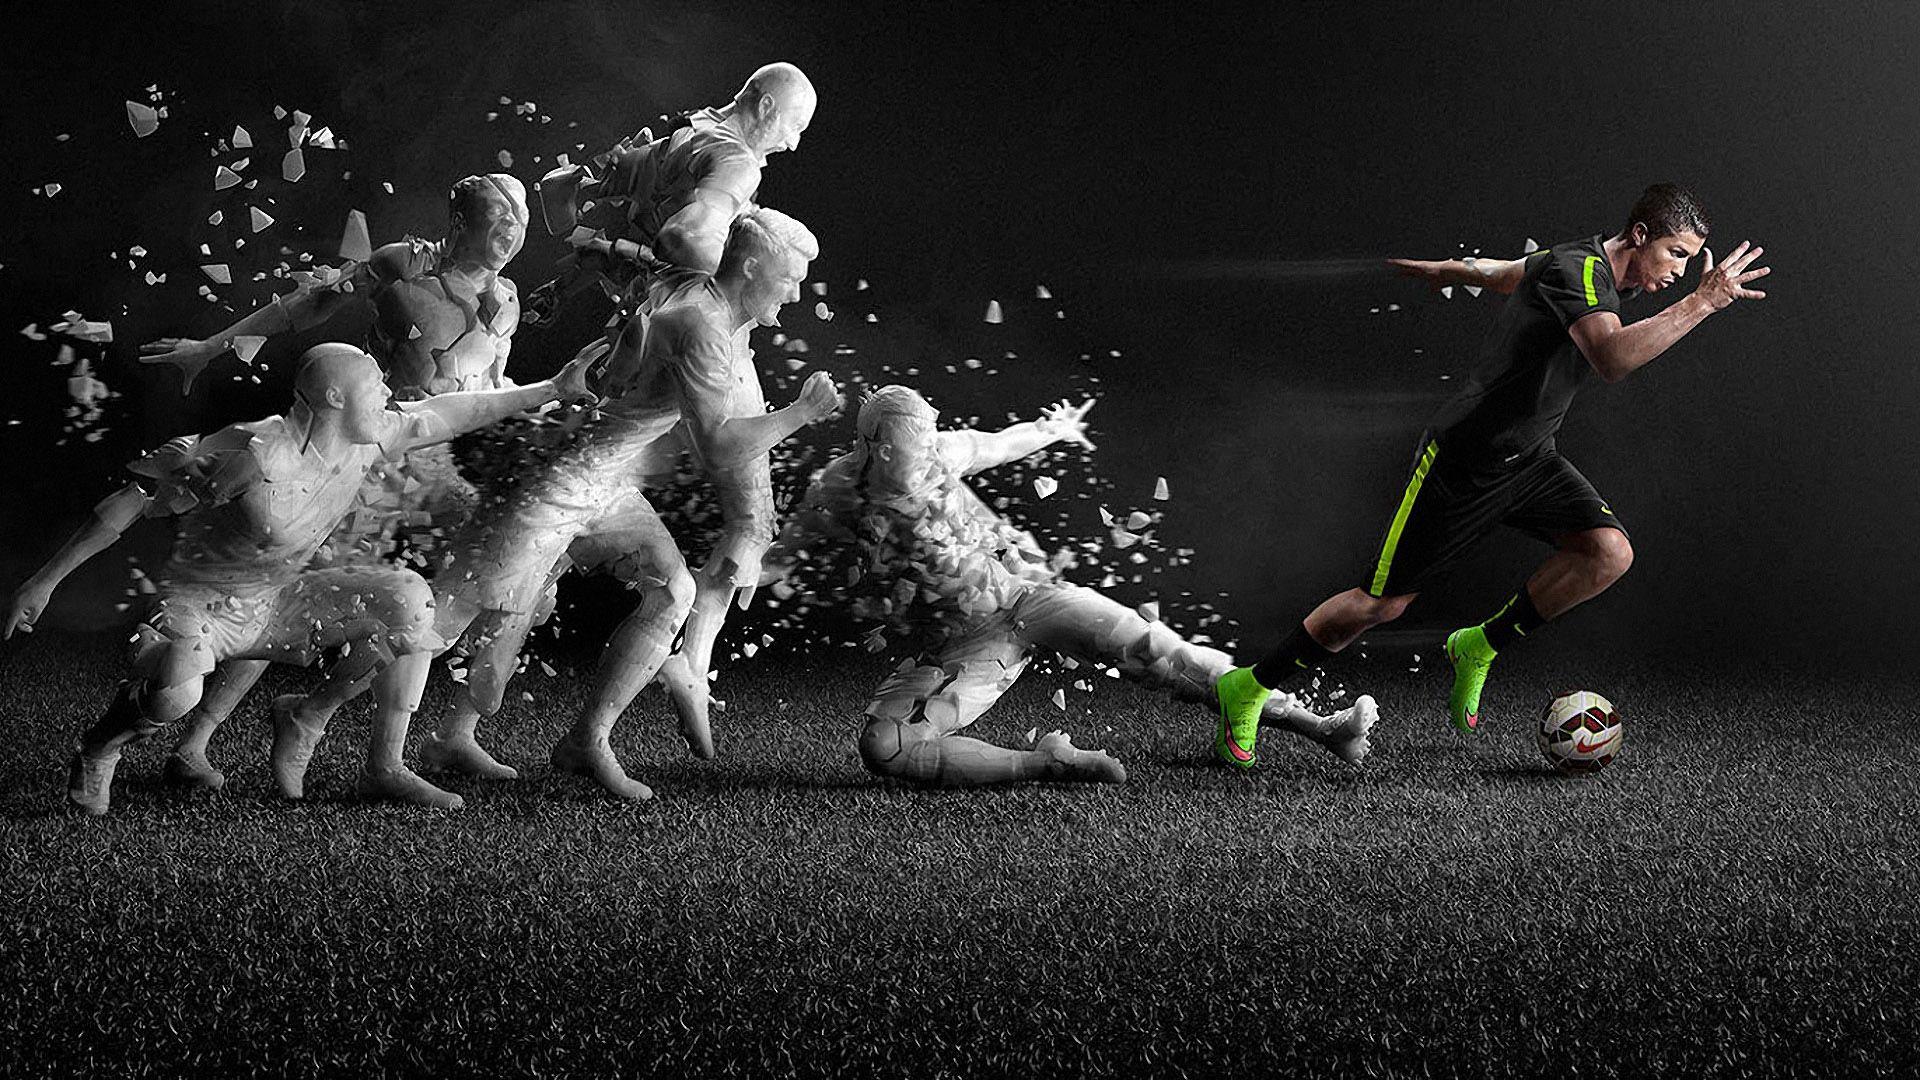 4733ea6524b Cristiano Ronaldo Nike Mercurial Wallpaper | Ayan | Ronaldo, Nike ...